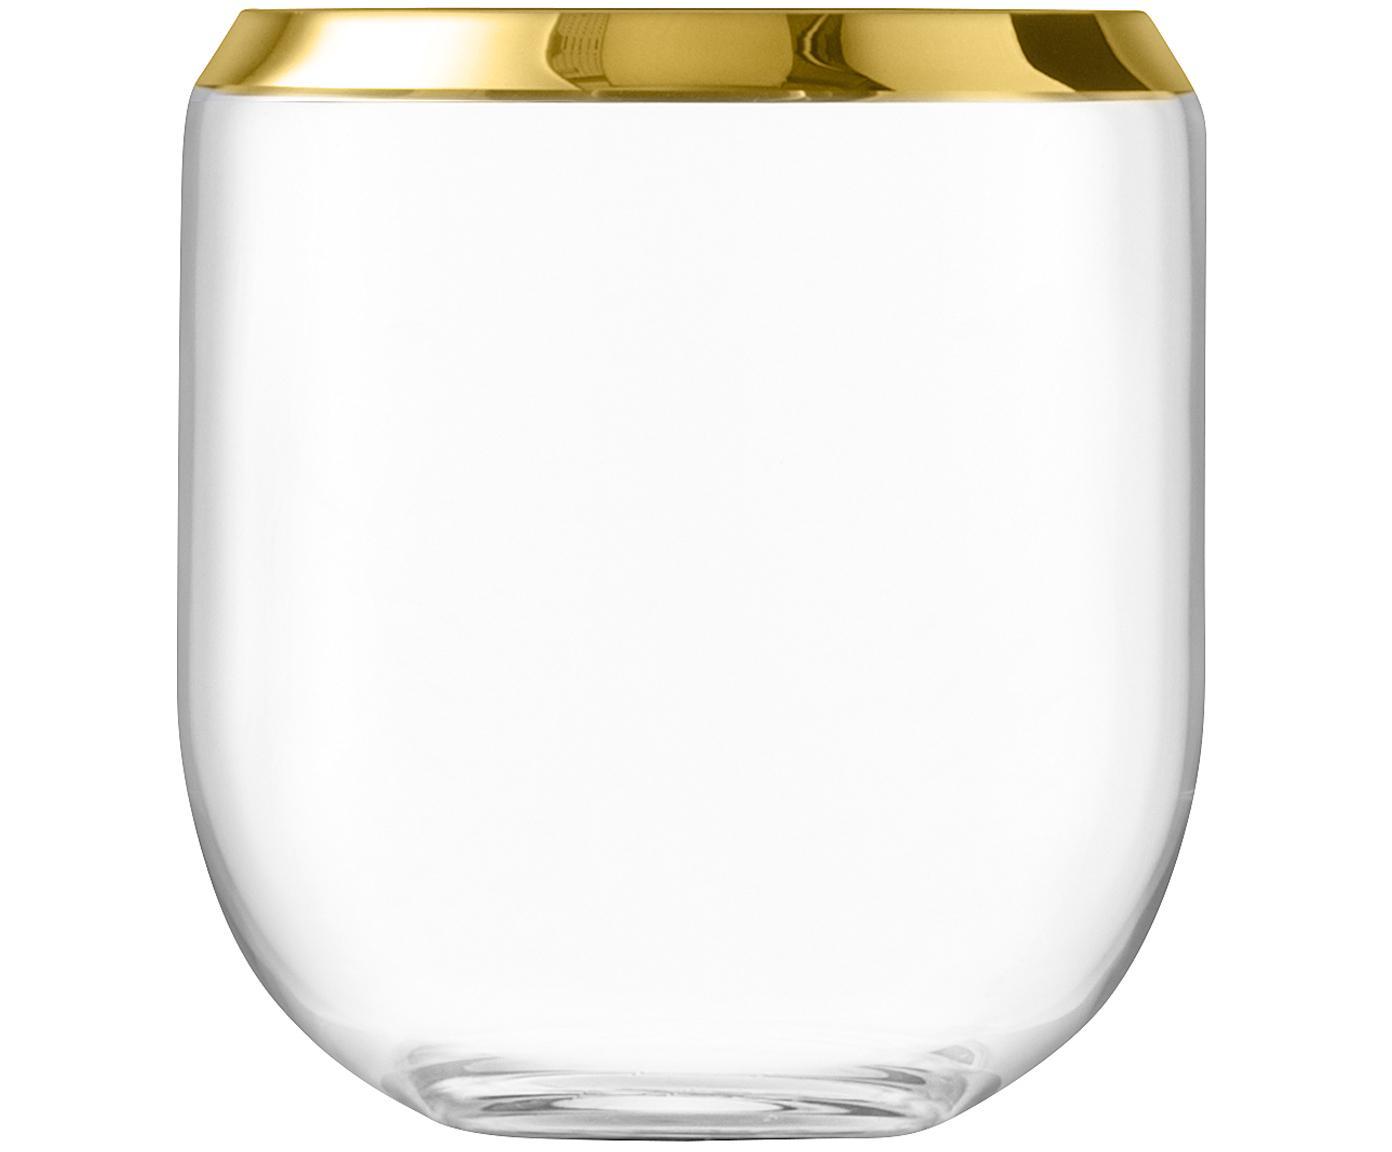 Jarrón de vidrio soplado Space, Vidrio, Transparente, dorado, Ø 18 x Al 20 cm